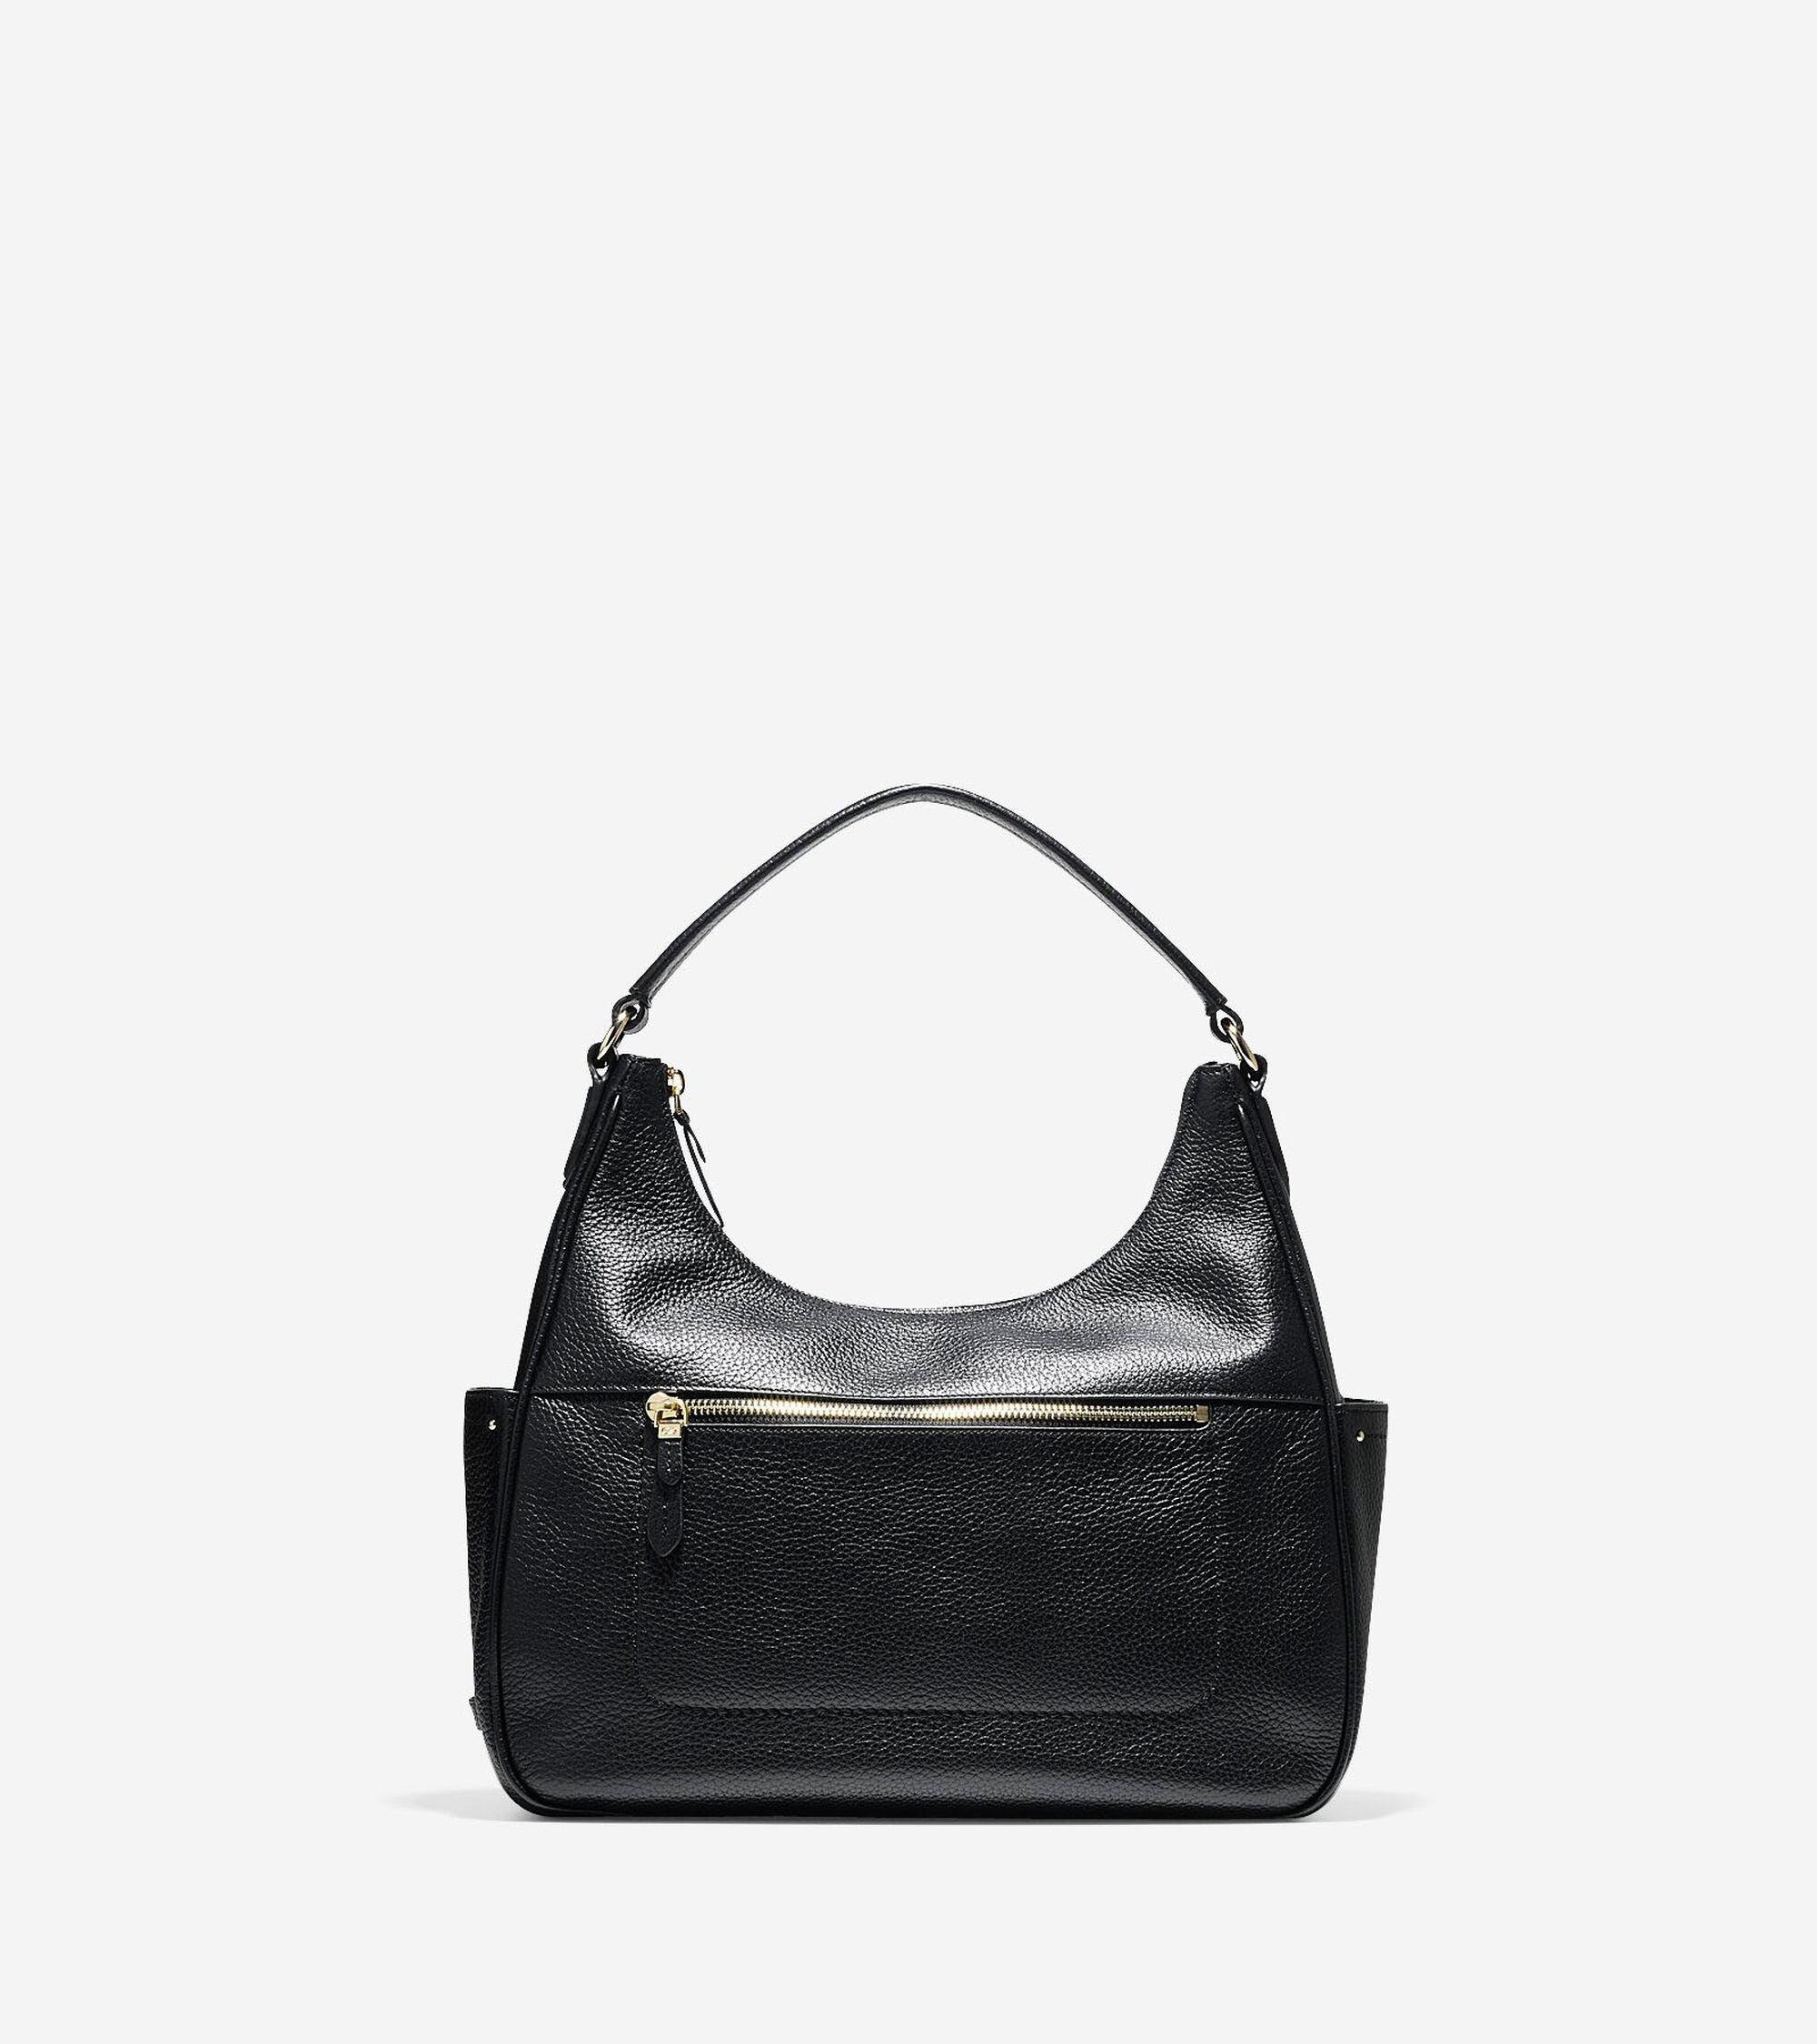 2bffae057f Tali Hobo in Black   Womens Handbags